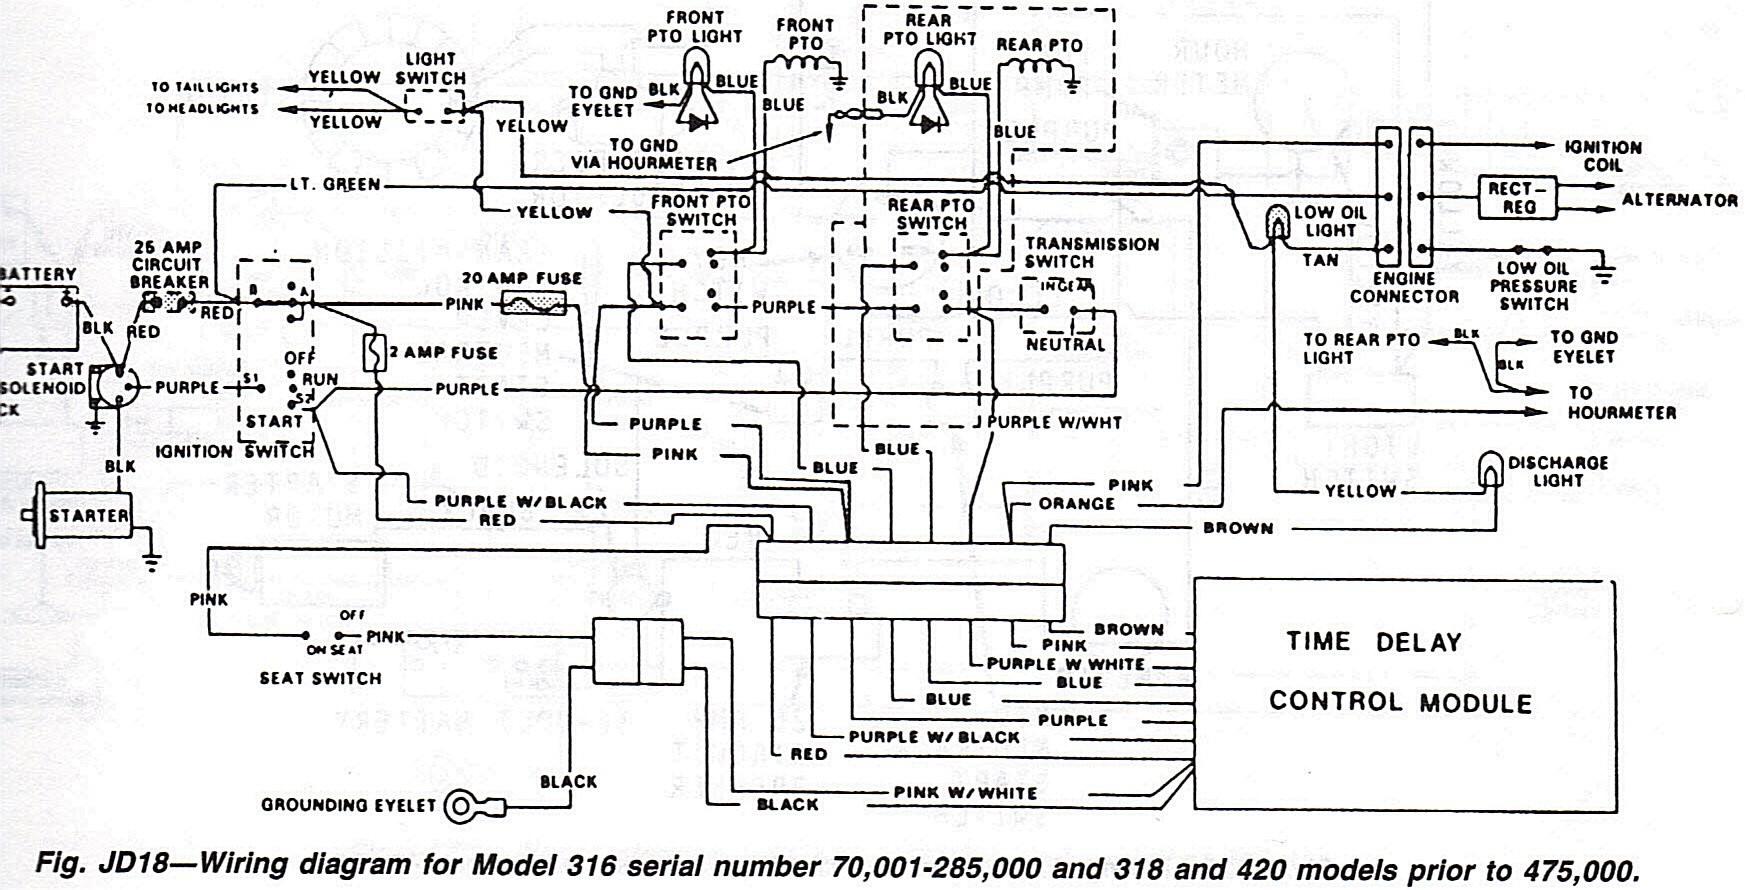 hight resolution of john deere l120 wiring schematic wiring diagram page john deere l120 wiring schematic